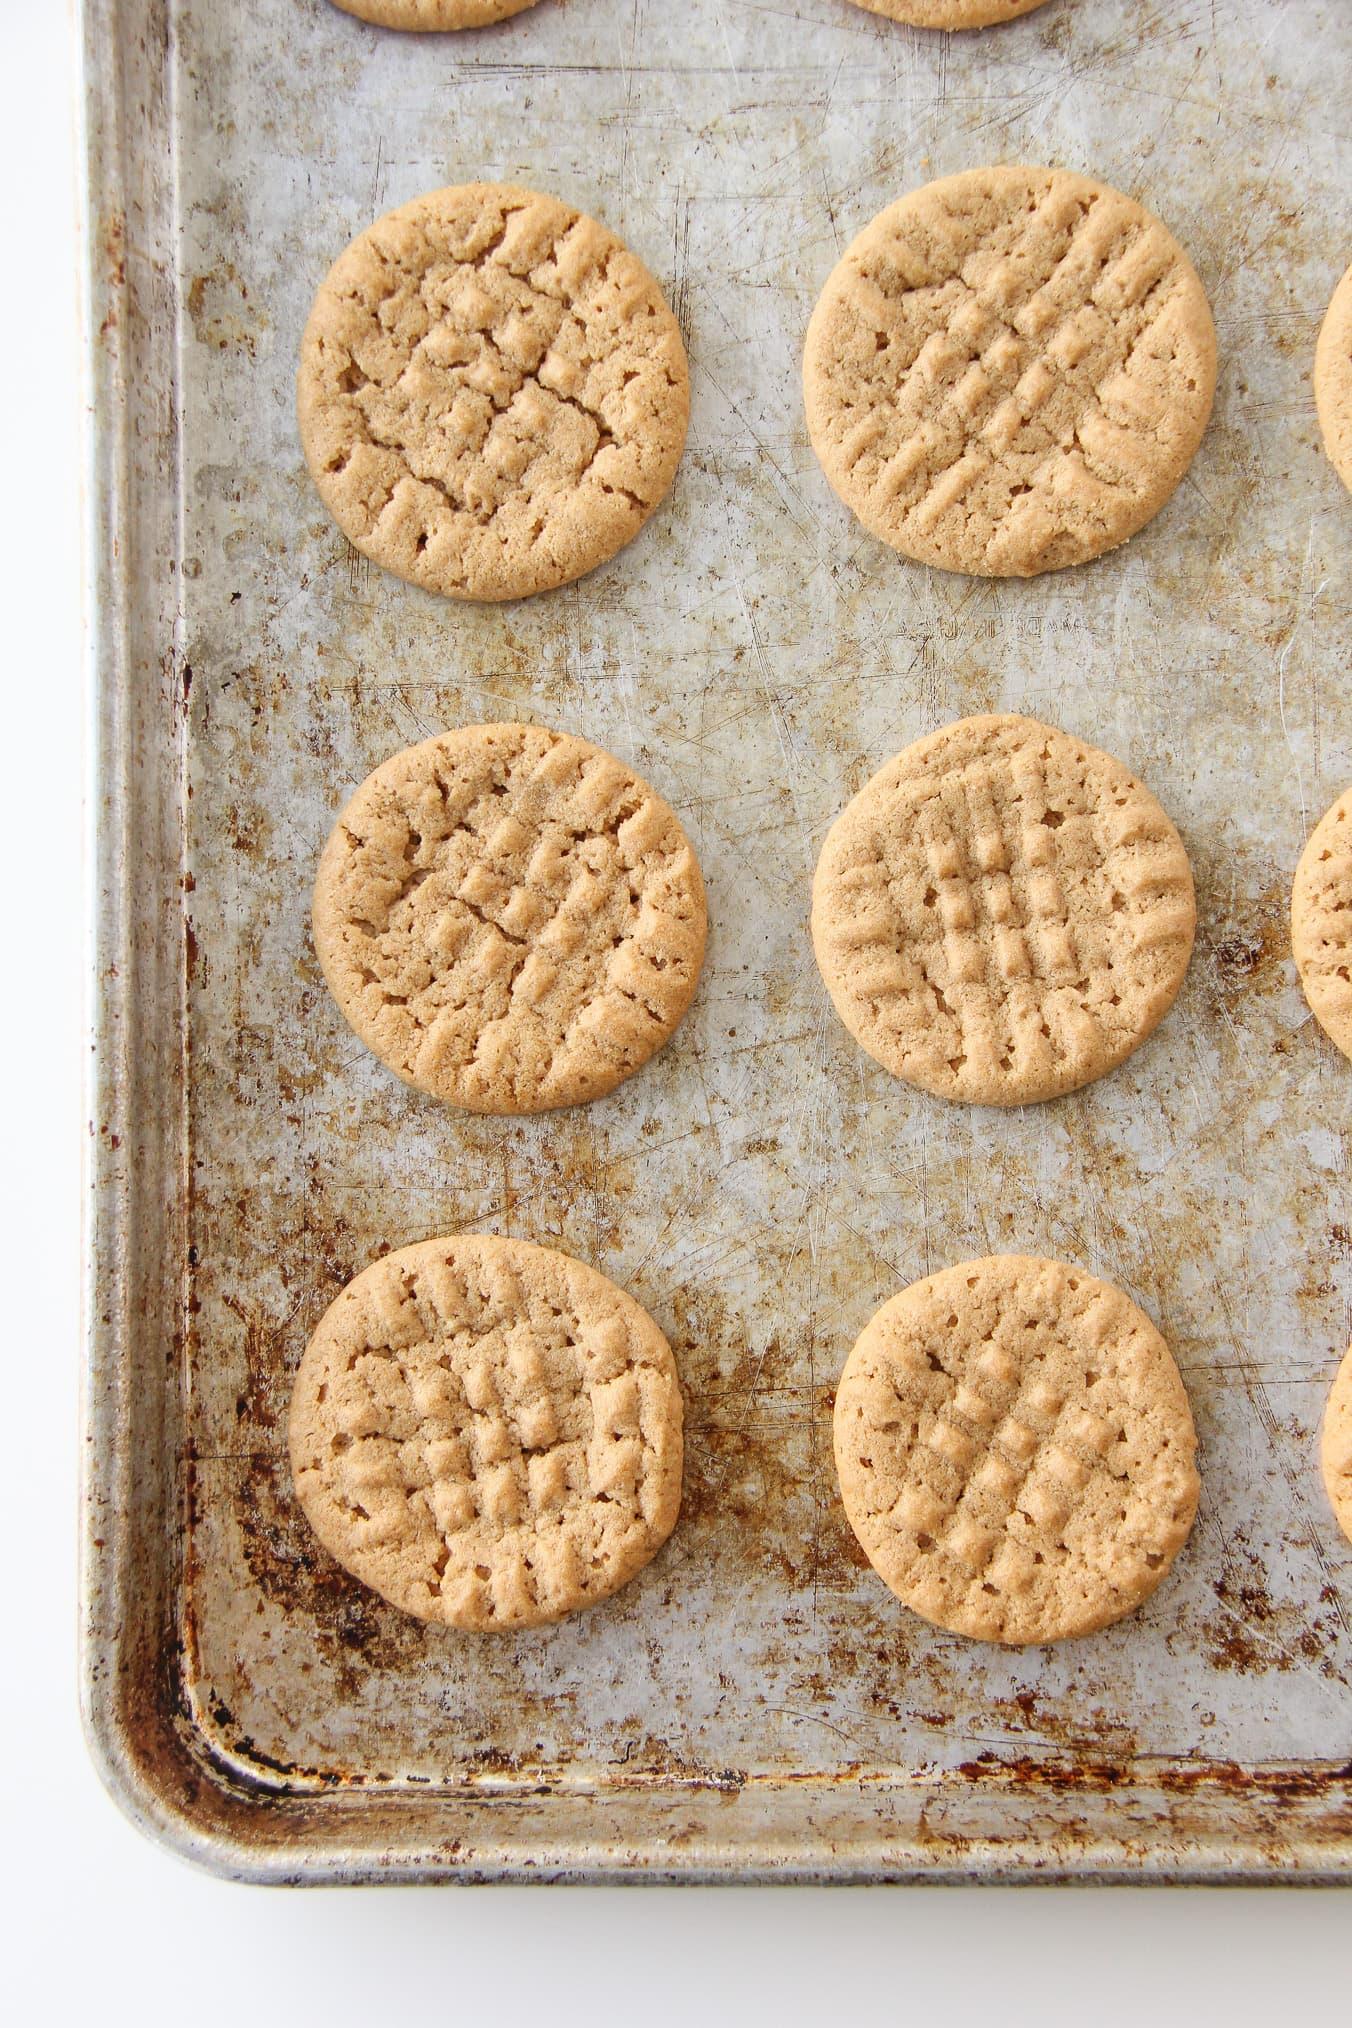 Grandma's Flourless Peanut Butter Cookies